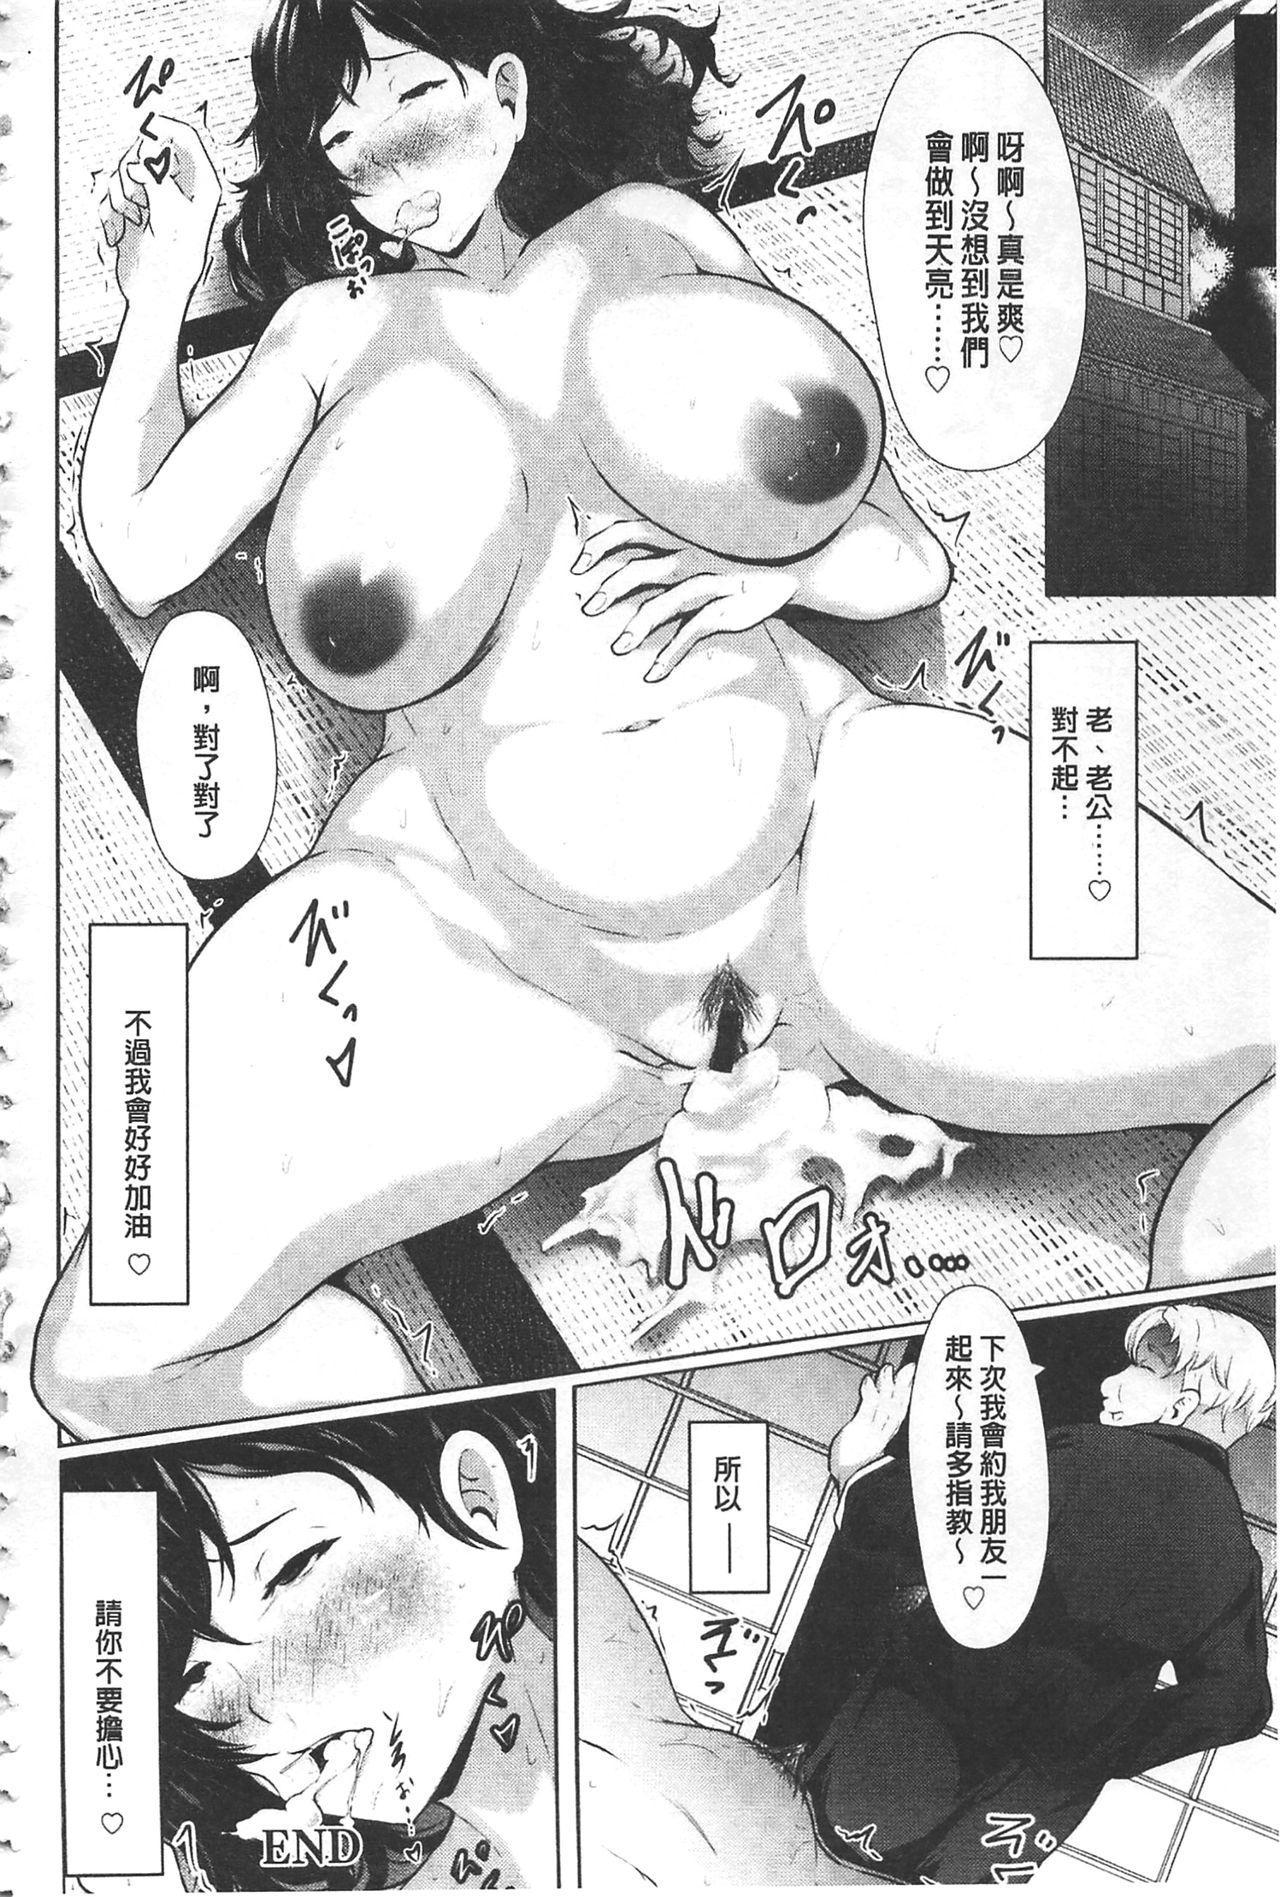 [Lorica] Biinkan Anal ~Kakusei Nejikomi Ana~ | 美淫感猥菊花 塞入擴張覺醒穴 [Chinese] 128